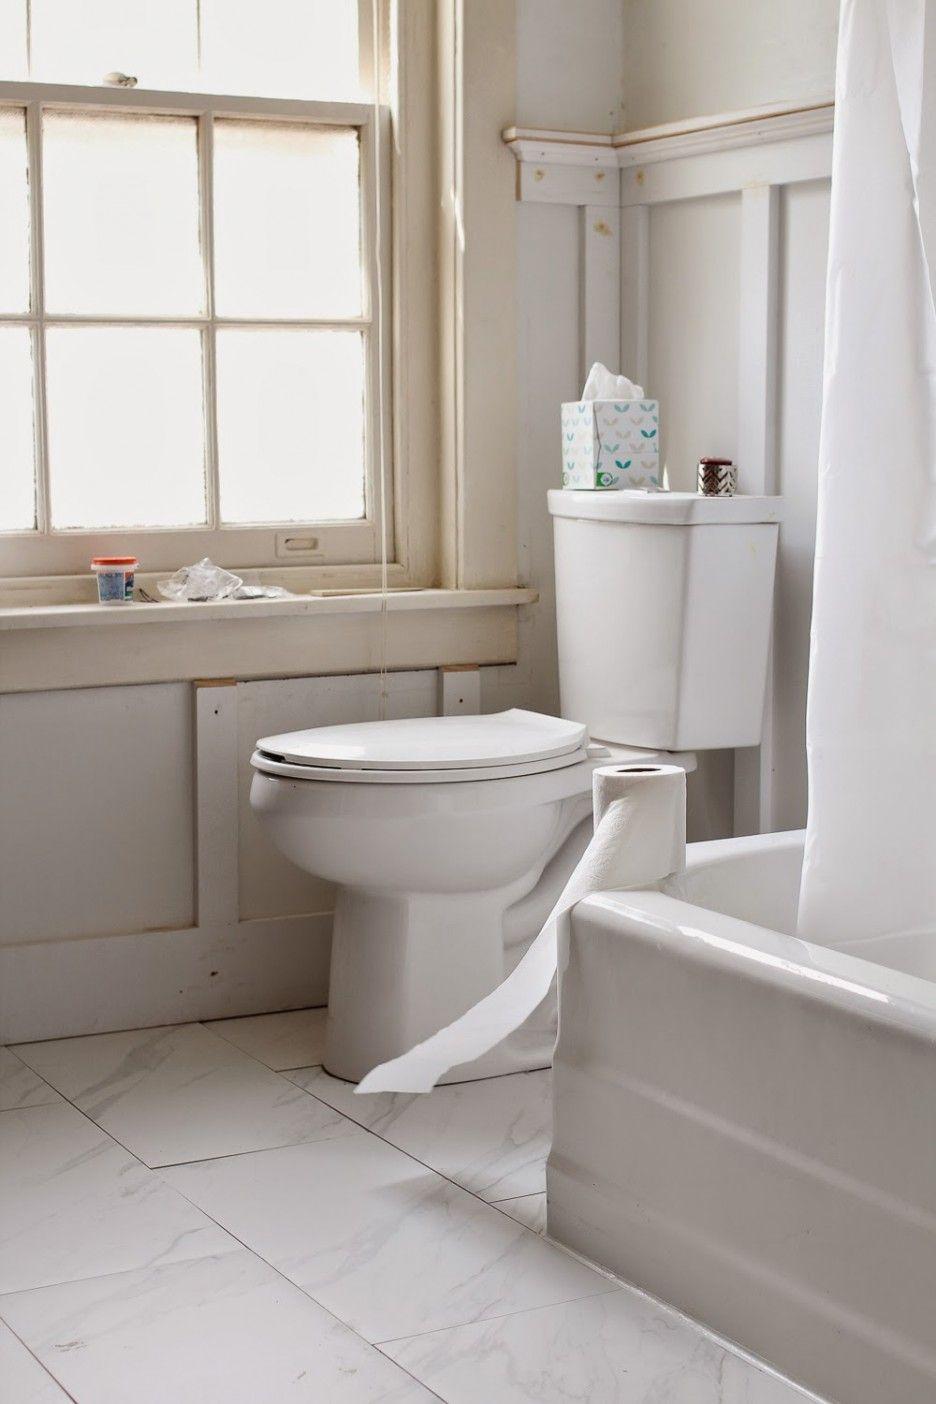 Divine Board And Batten Bathroom Design Featuring White Wooden ...